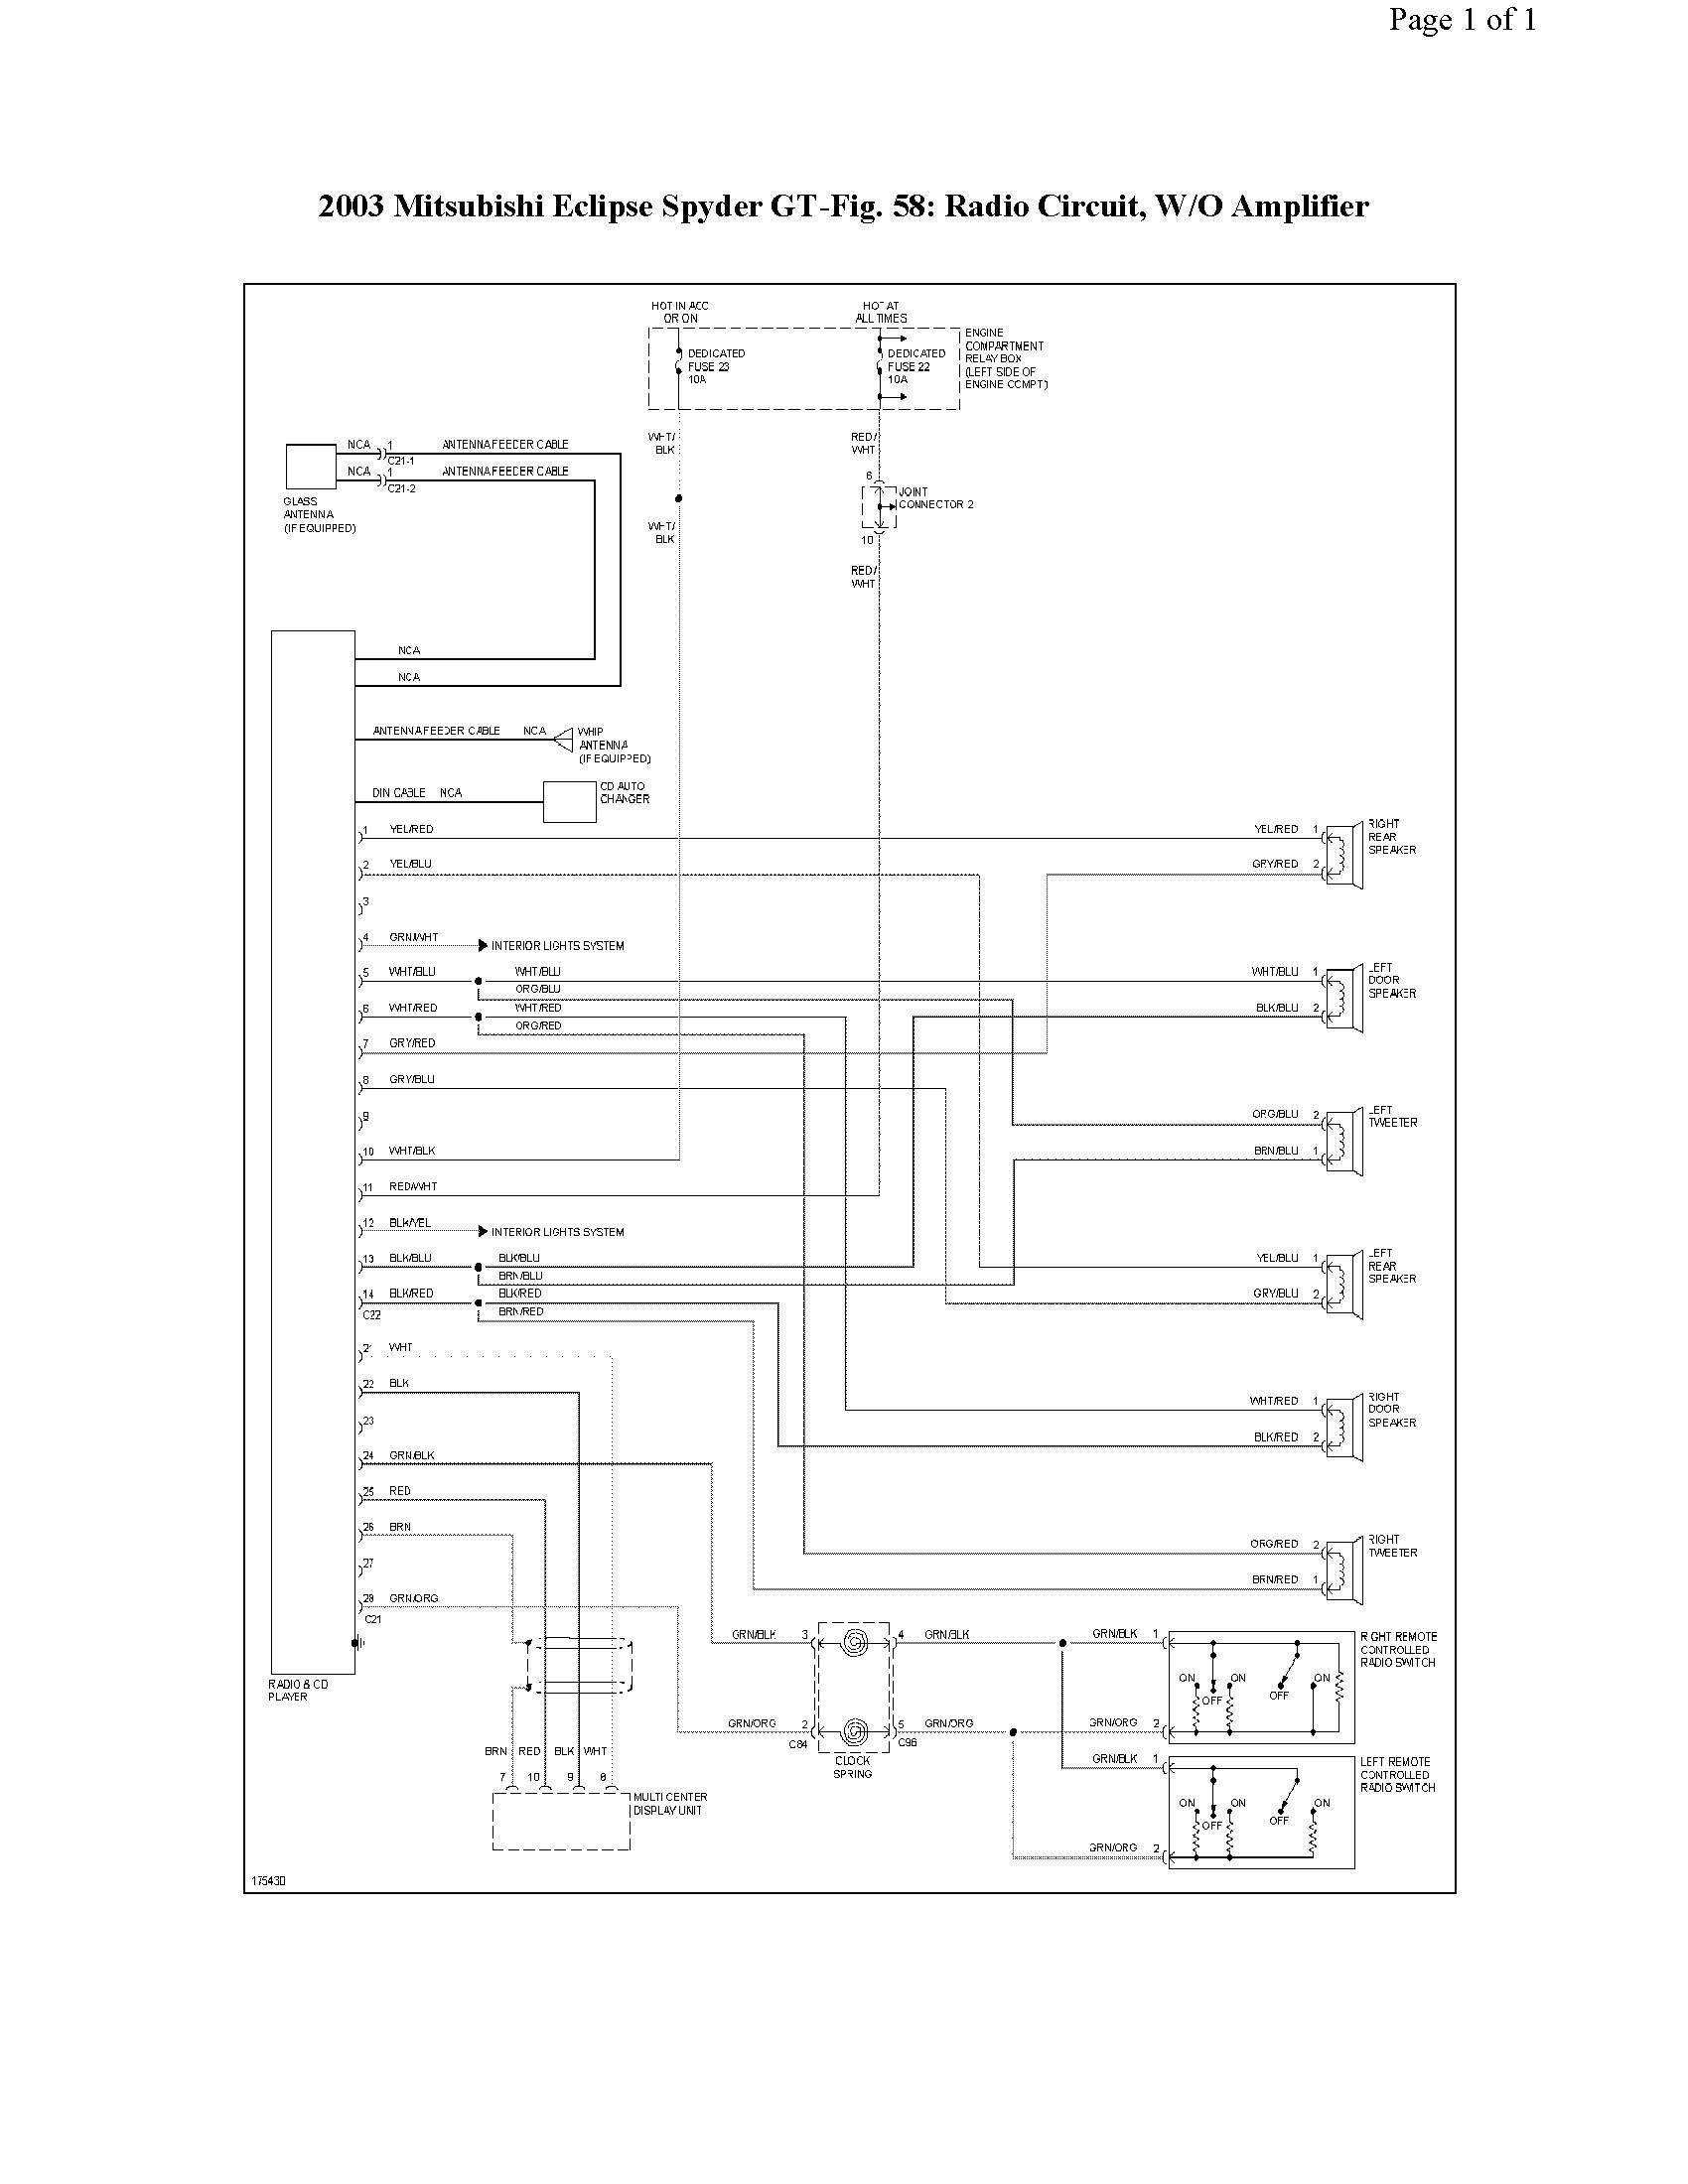 2001 Mitsubishi Eclipse Engine Diagram Wiring Diagram Moreover 2001 Mitsubishi  Eclipse Radio Wiring Diagram Of 2001